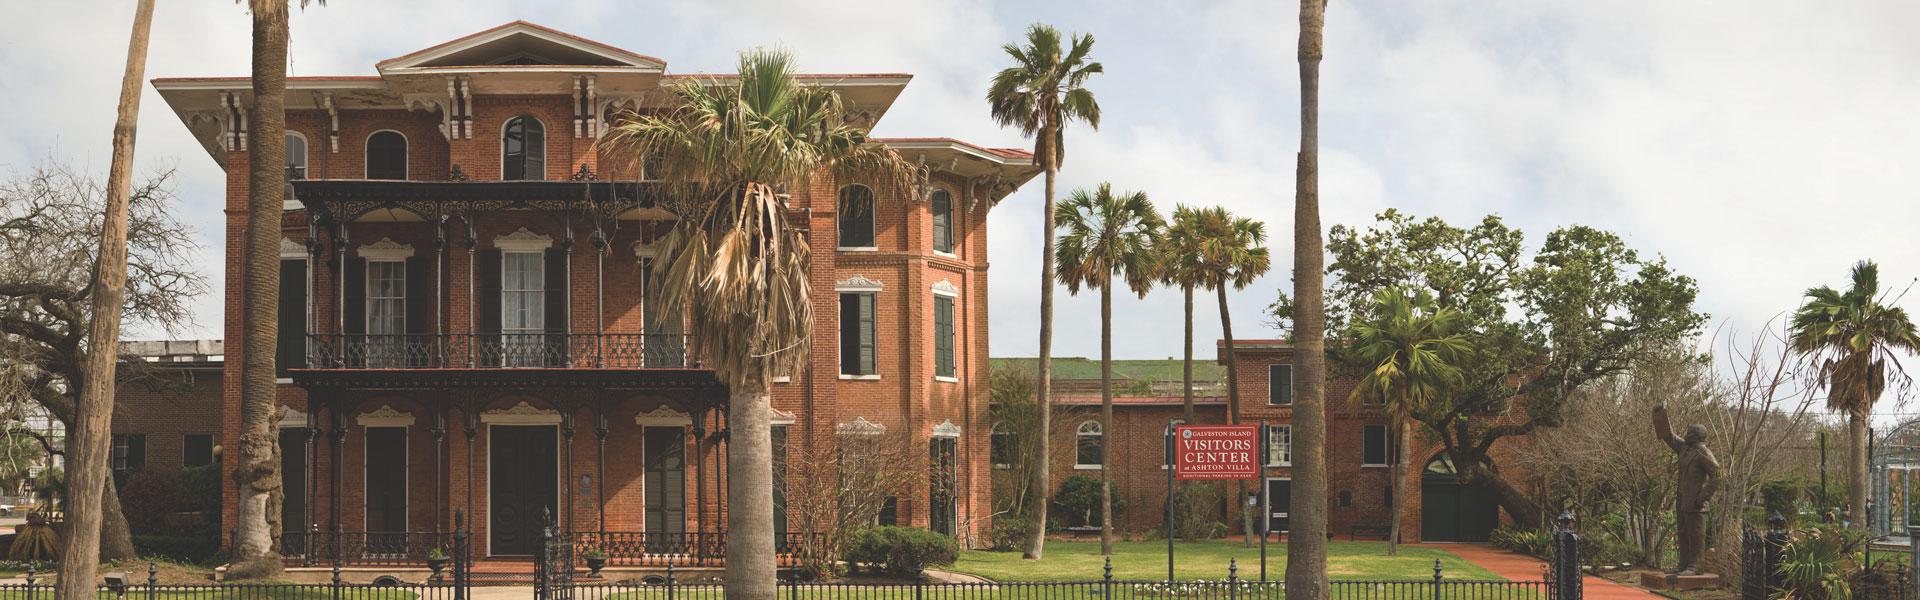 1859 Ashton Villa, Galveston, TX